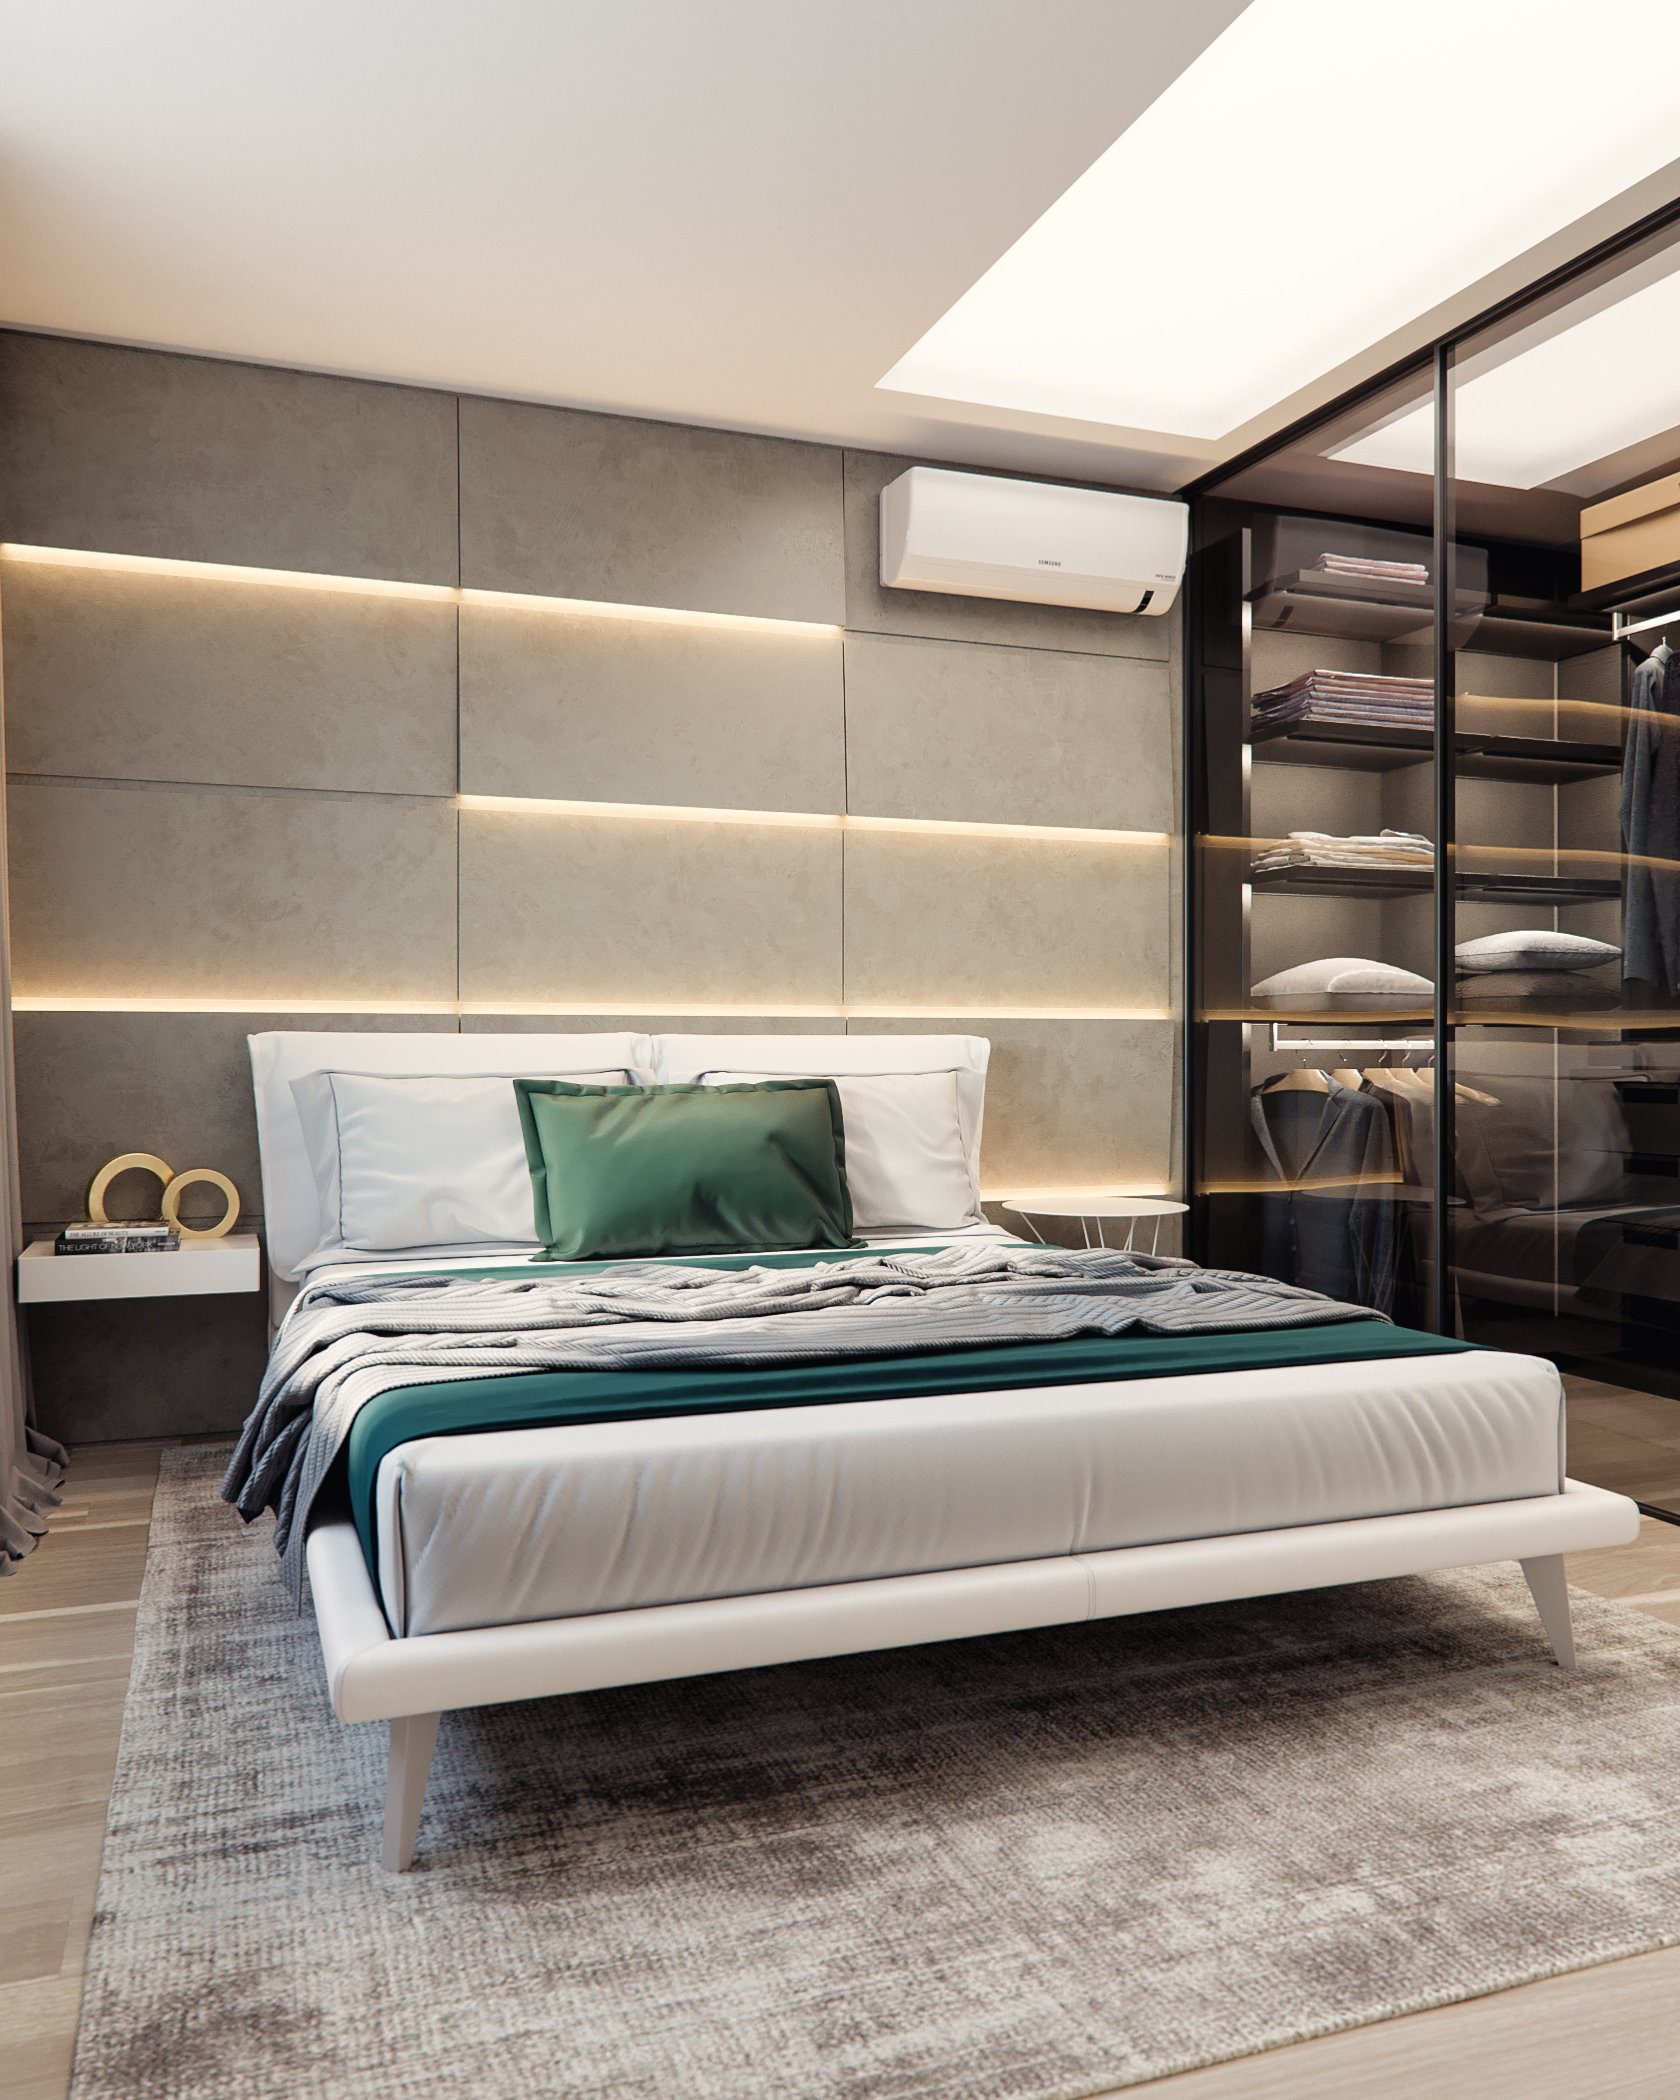 Bedroom in residential complex